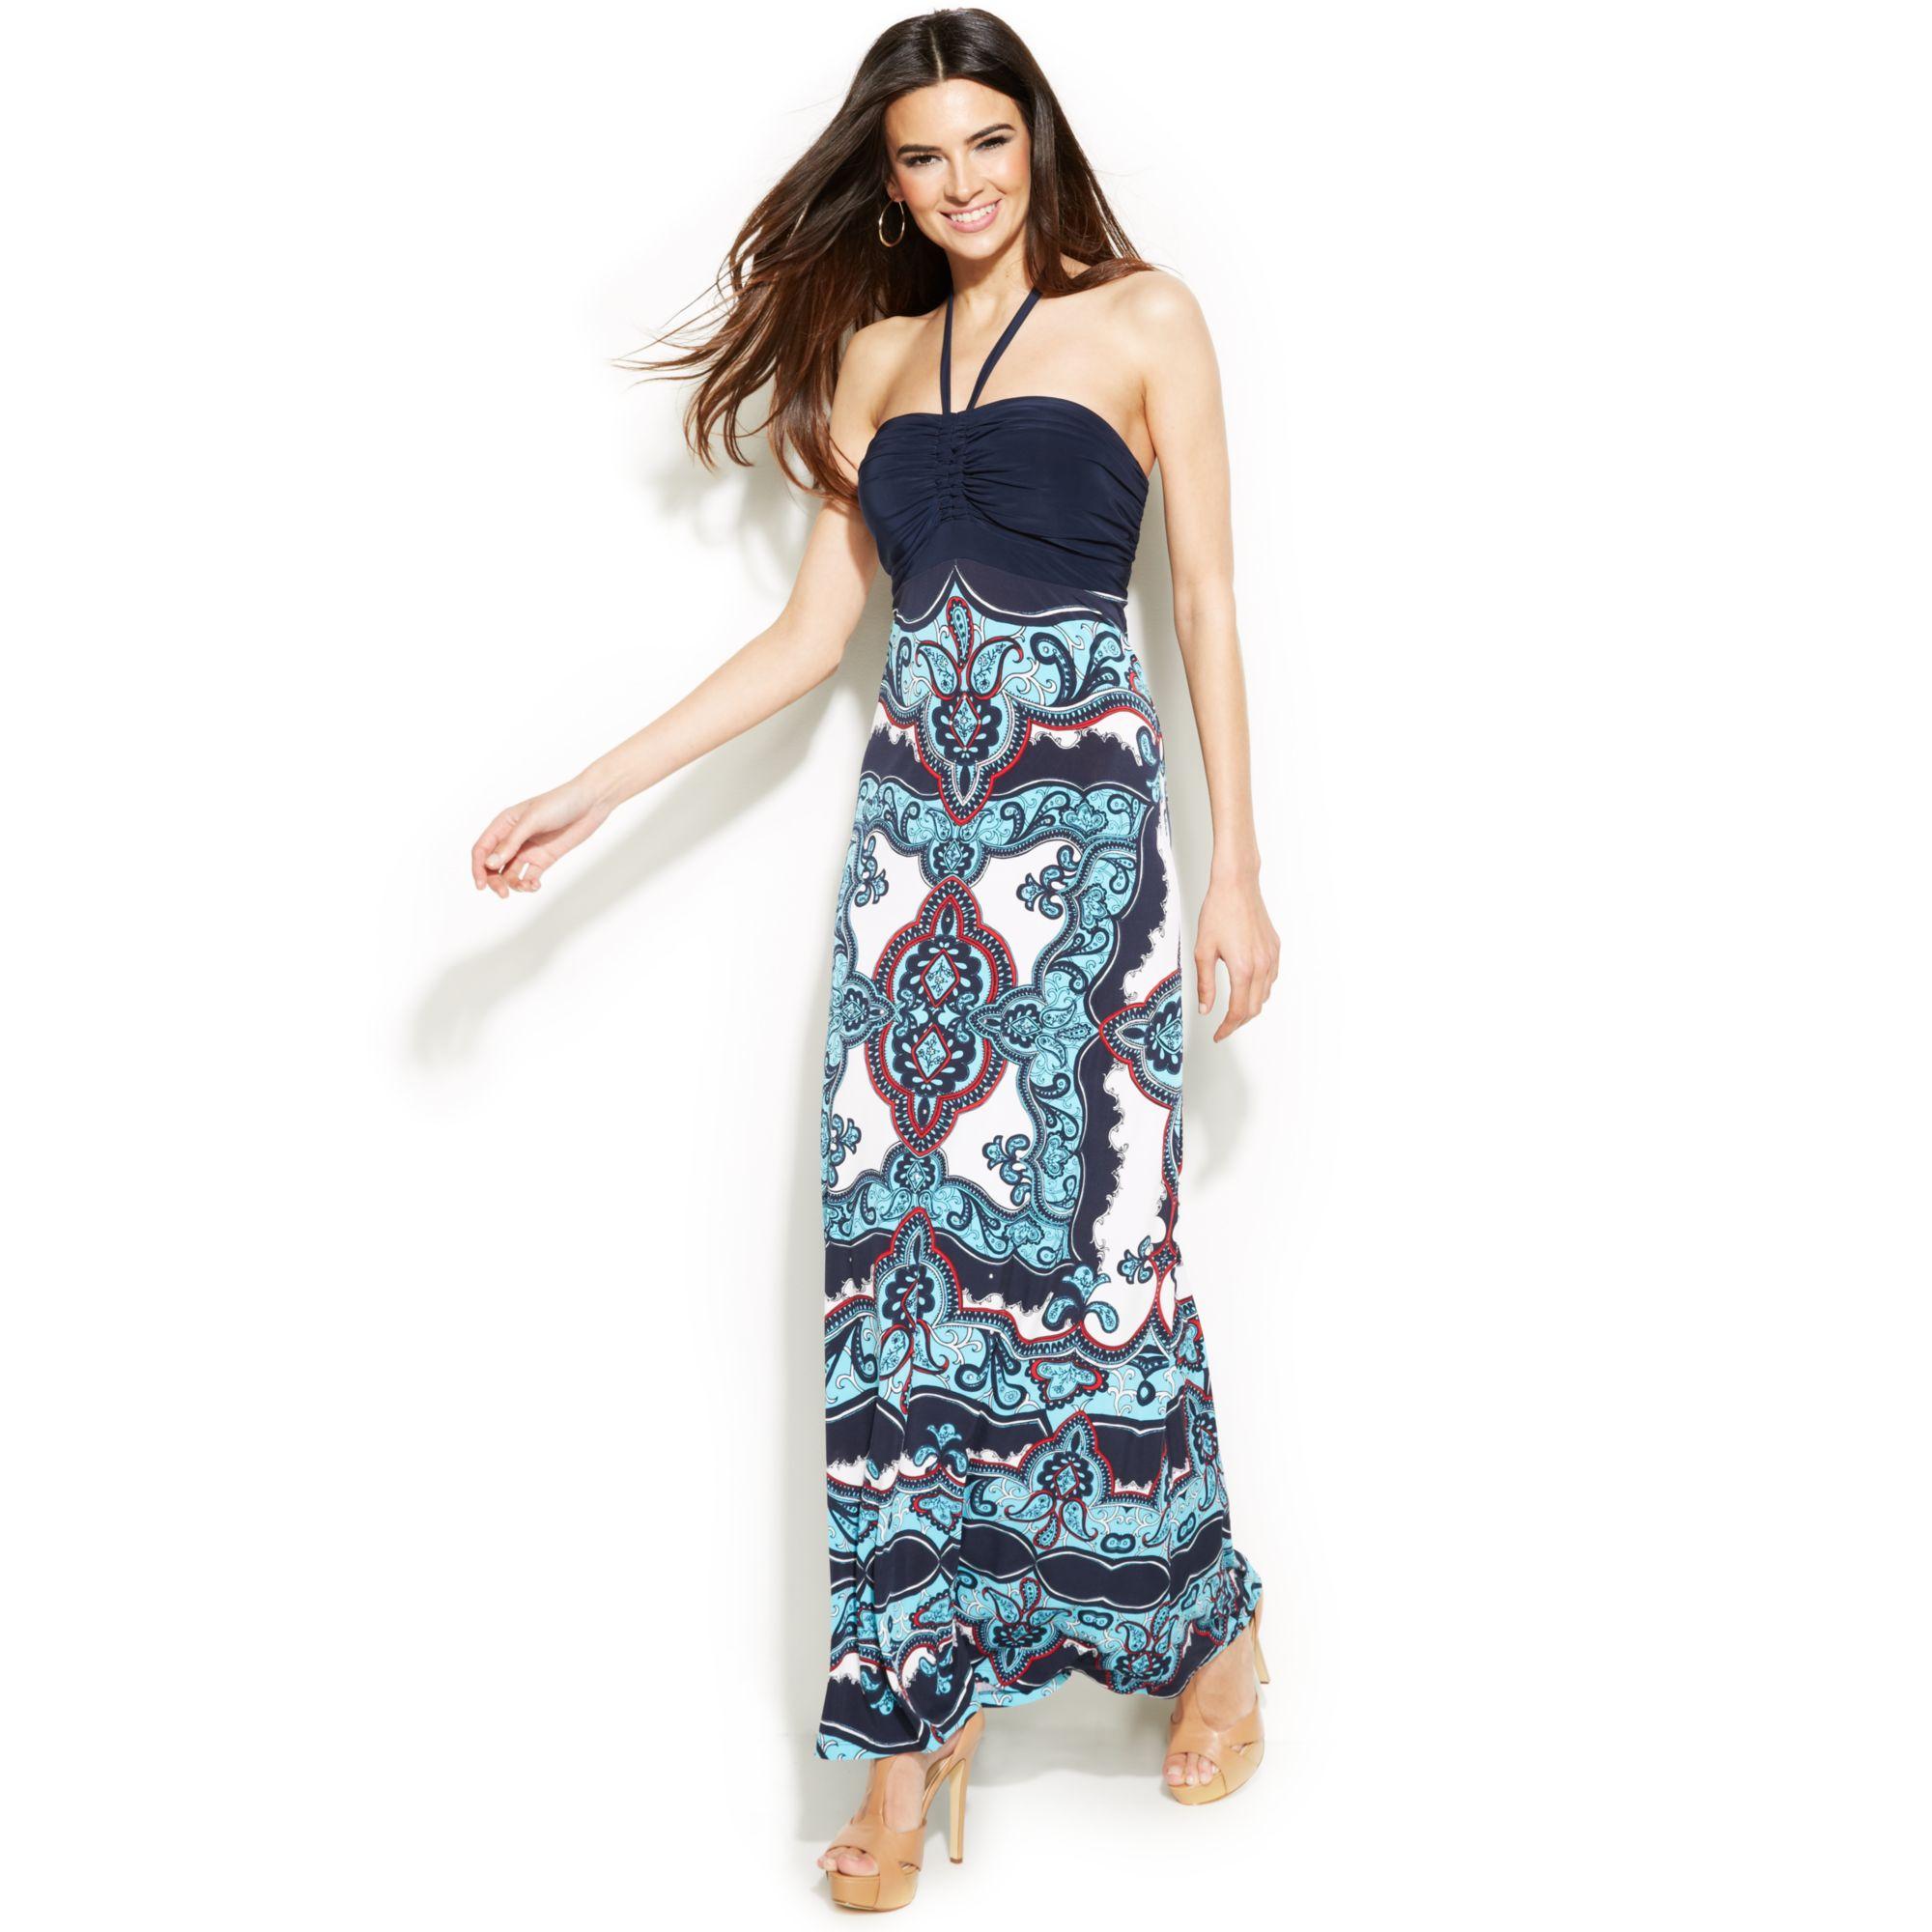 de00f5c23eba5 INC International Concepts Embellished Printed Halter Maxi Dress - Lyst